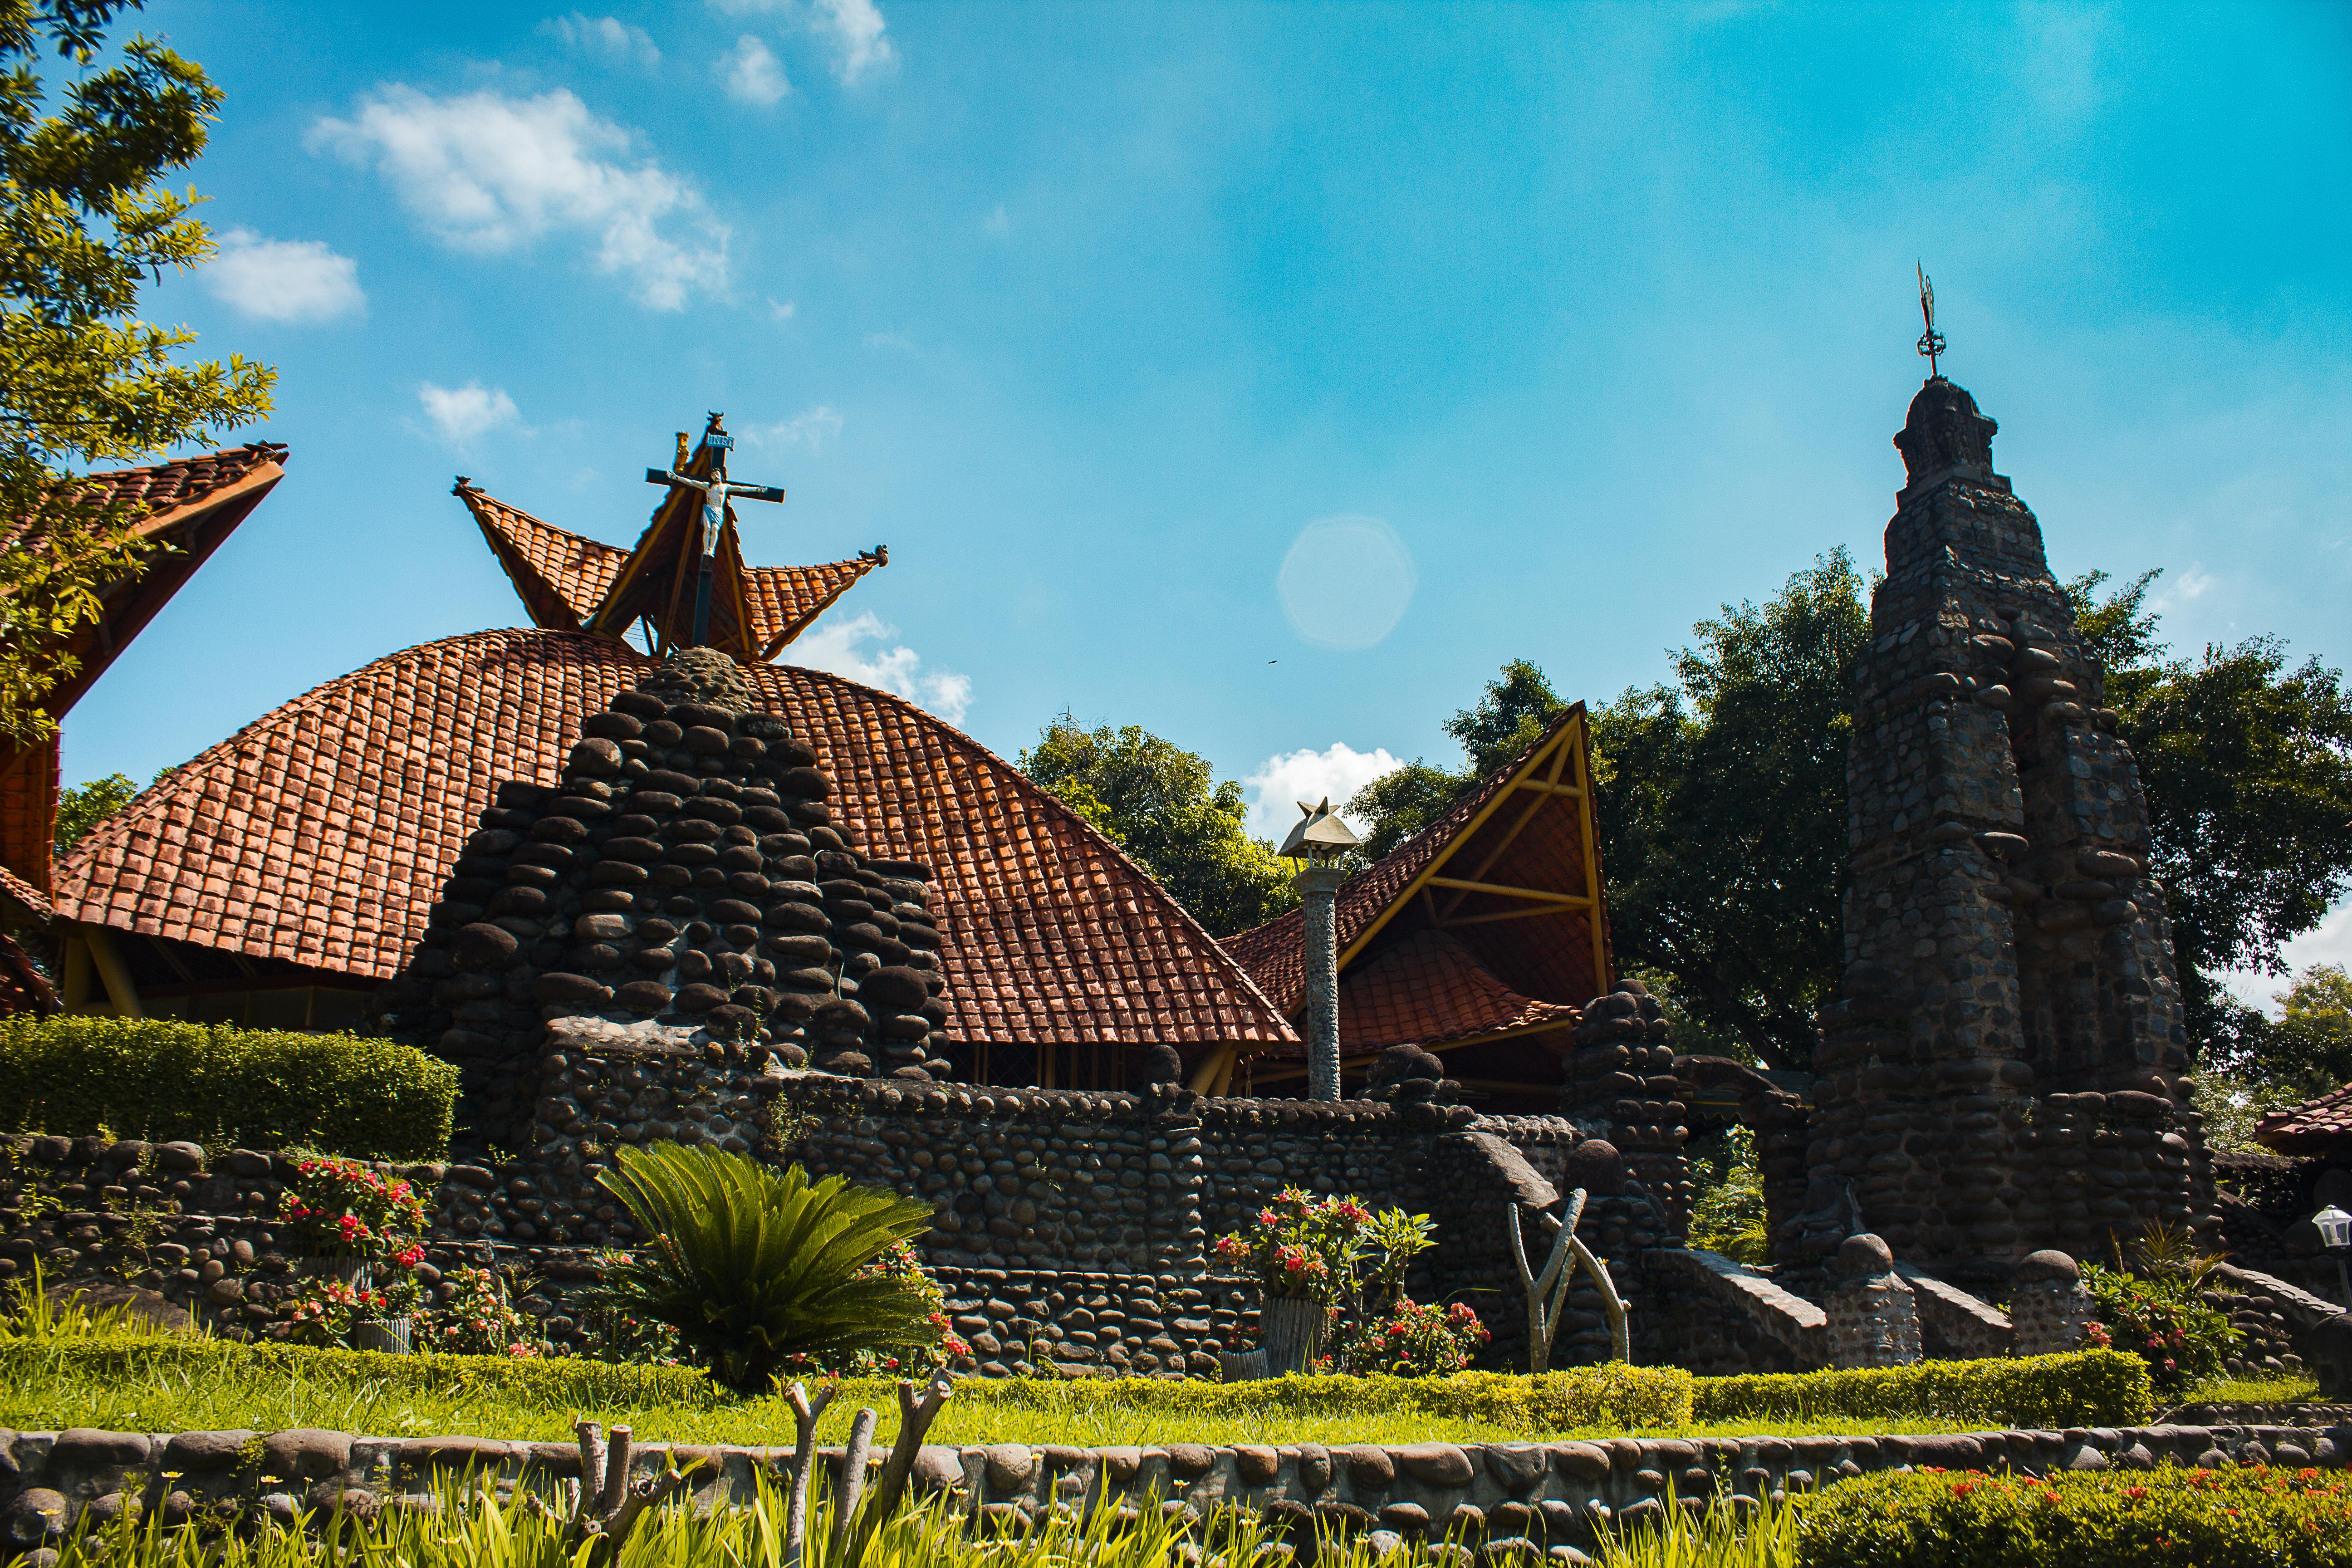 Gereja Pohsarang Gua Maria Lourdes Kediri Jawa Timur Steemit Sumber